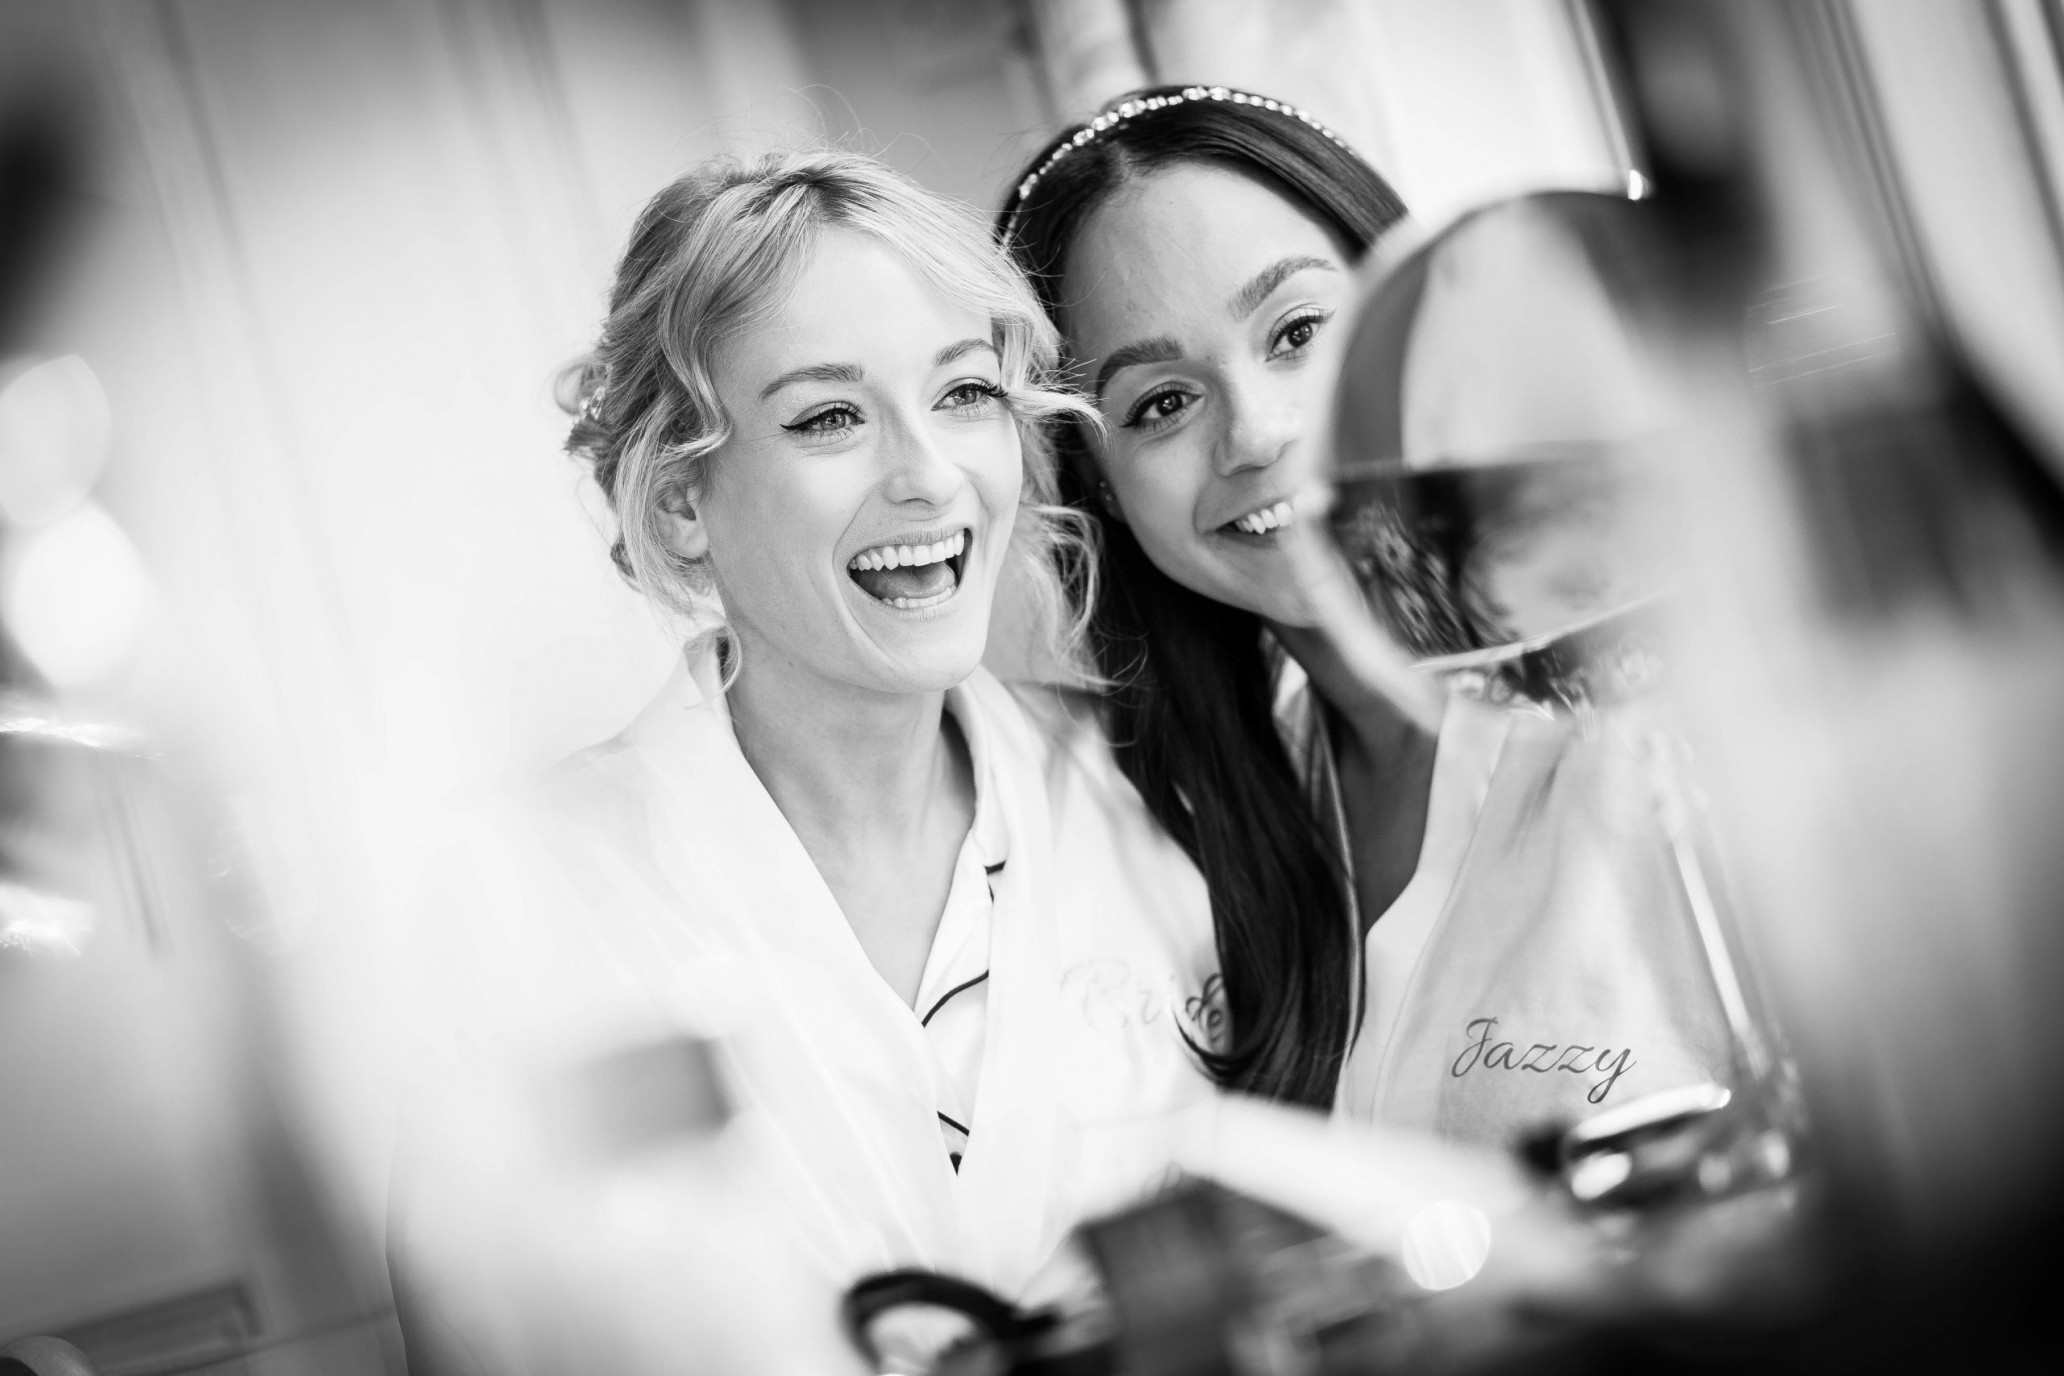 Cheap Wedding Photographers Glasgow - https://bigdayproductions.co.uk